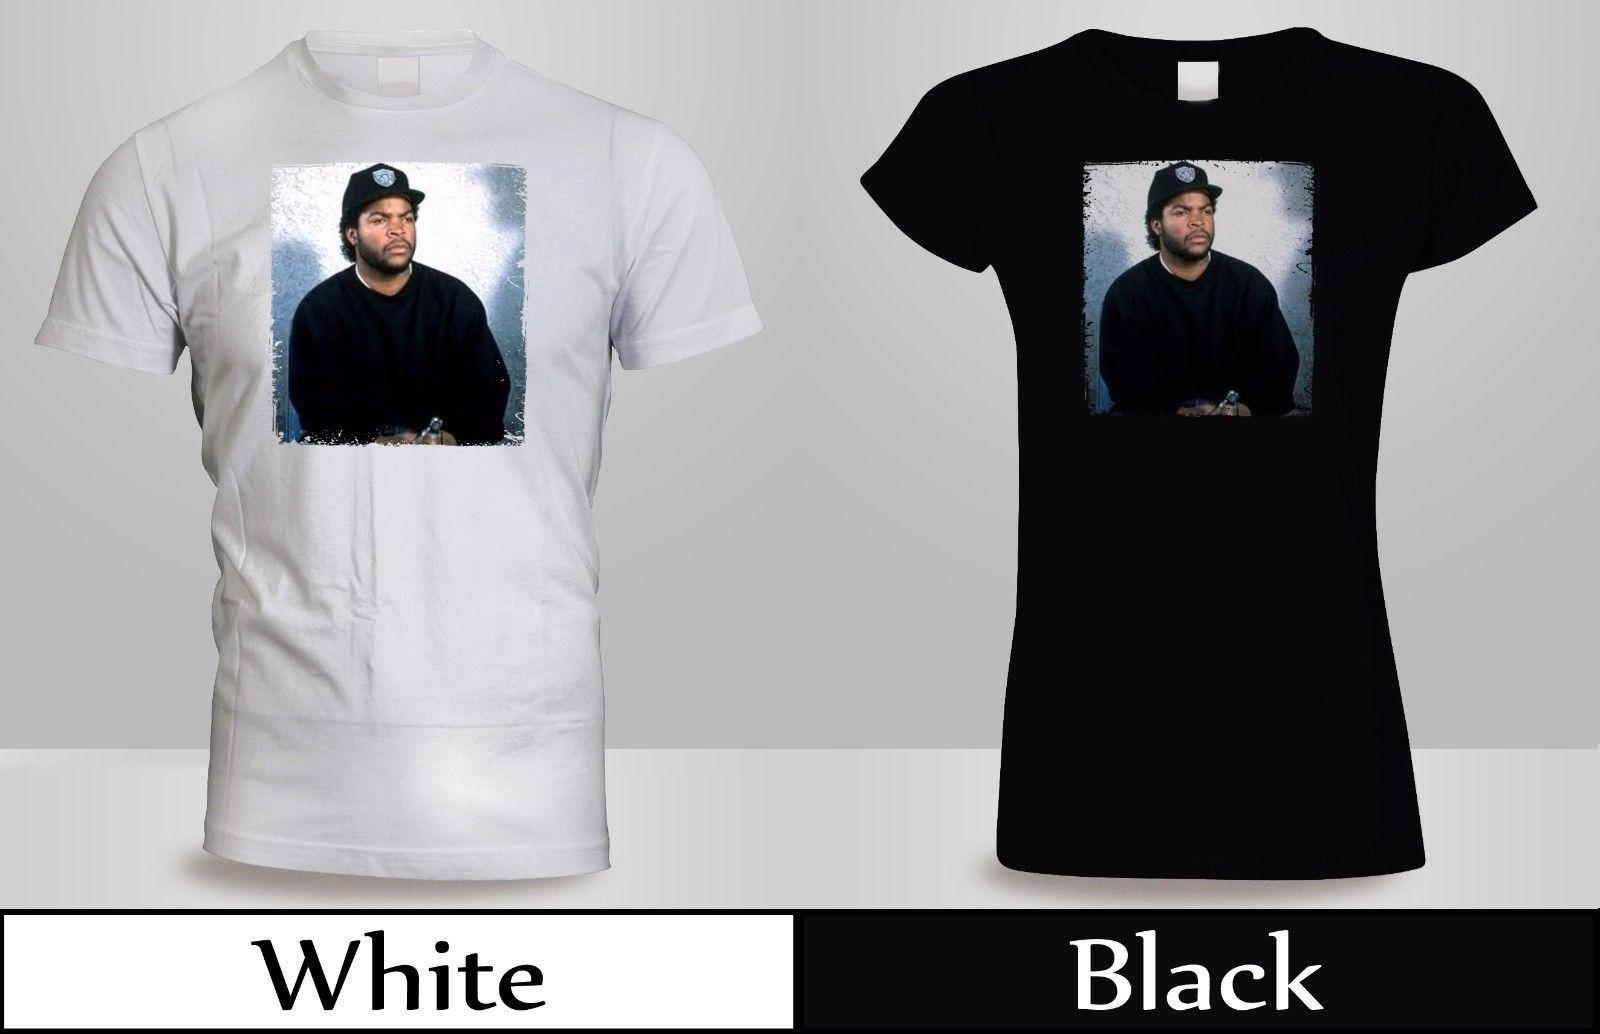 18d9e9201a06 DOUGHBOY BOYZ N THE HOOD T-SHIRT Men's/Women's Black&Whiite ICE CUBE Shirt  2 Funny free shipping Unisex Casual top